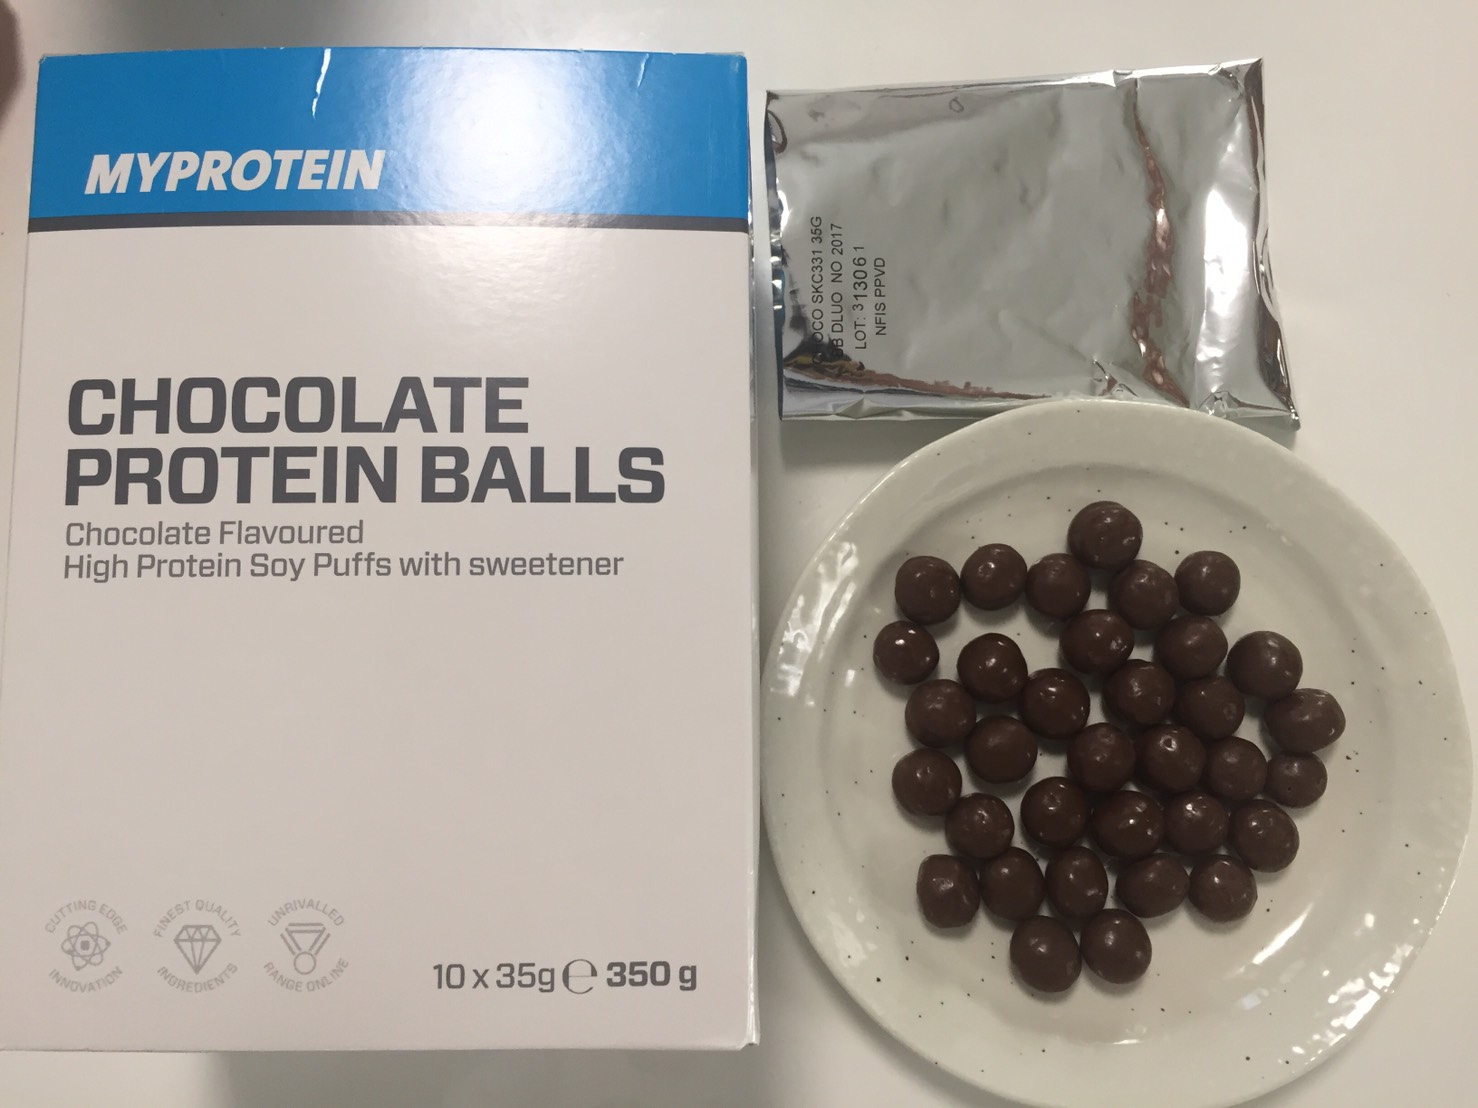 「CHOCOLATE PROTEIN BALLS(チョコレート・プロテインボール)」を開封した様子